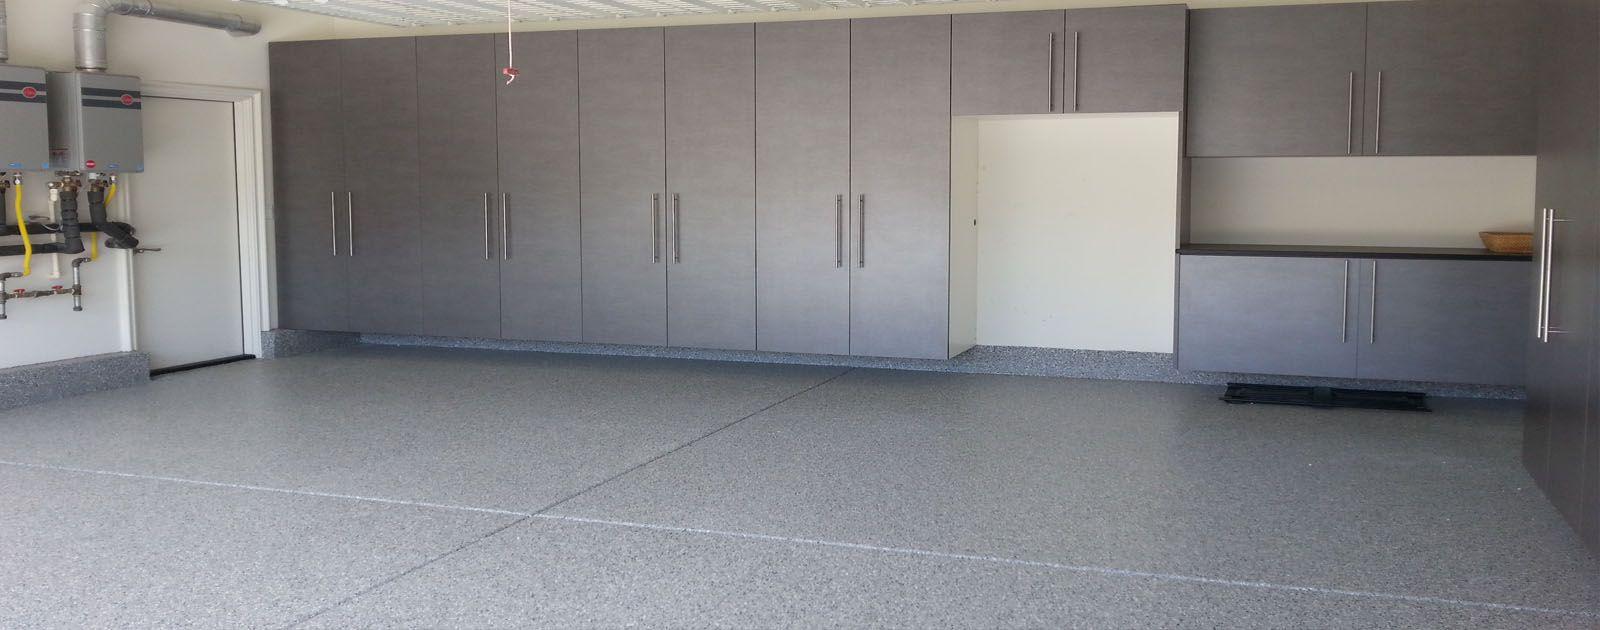 Ca Resurfacing 1 Day Garage Floors Orange County Epoxy Coatings Garage Flooring Orange County Garage Fl Garage Floor Garage Floor Coatings Garage Epoxy